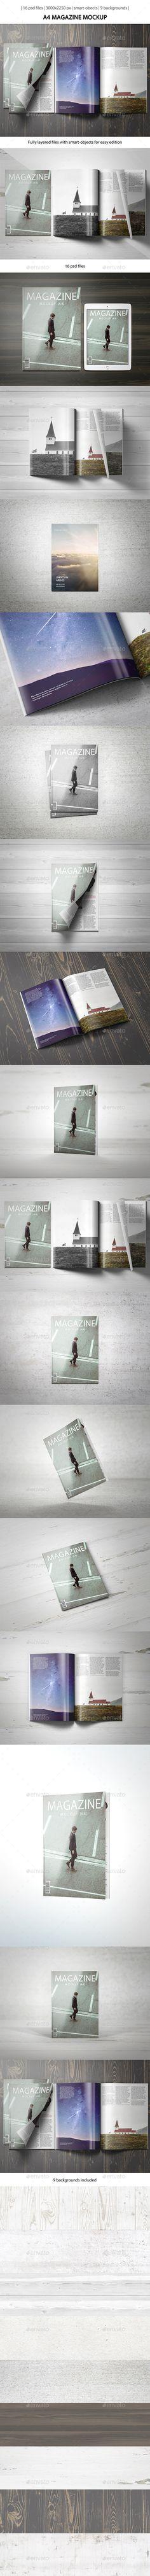 A4 Magazine Mockup | Download: http://graphicriver.net/item/a4-magazine-mockup/9992209?ref=ksioks